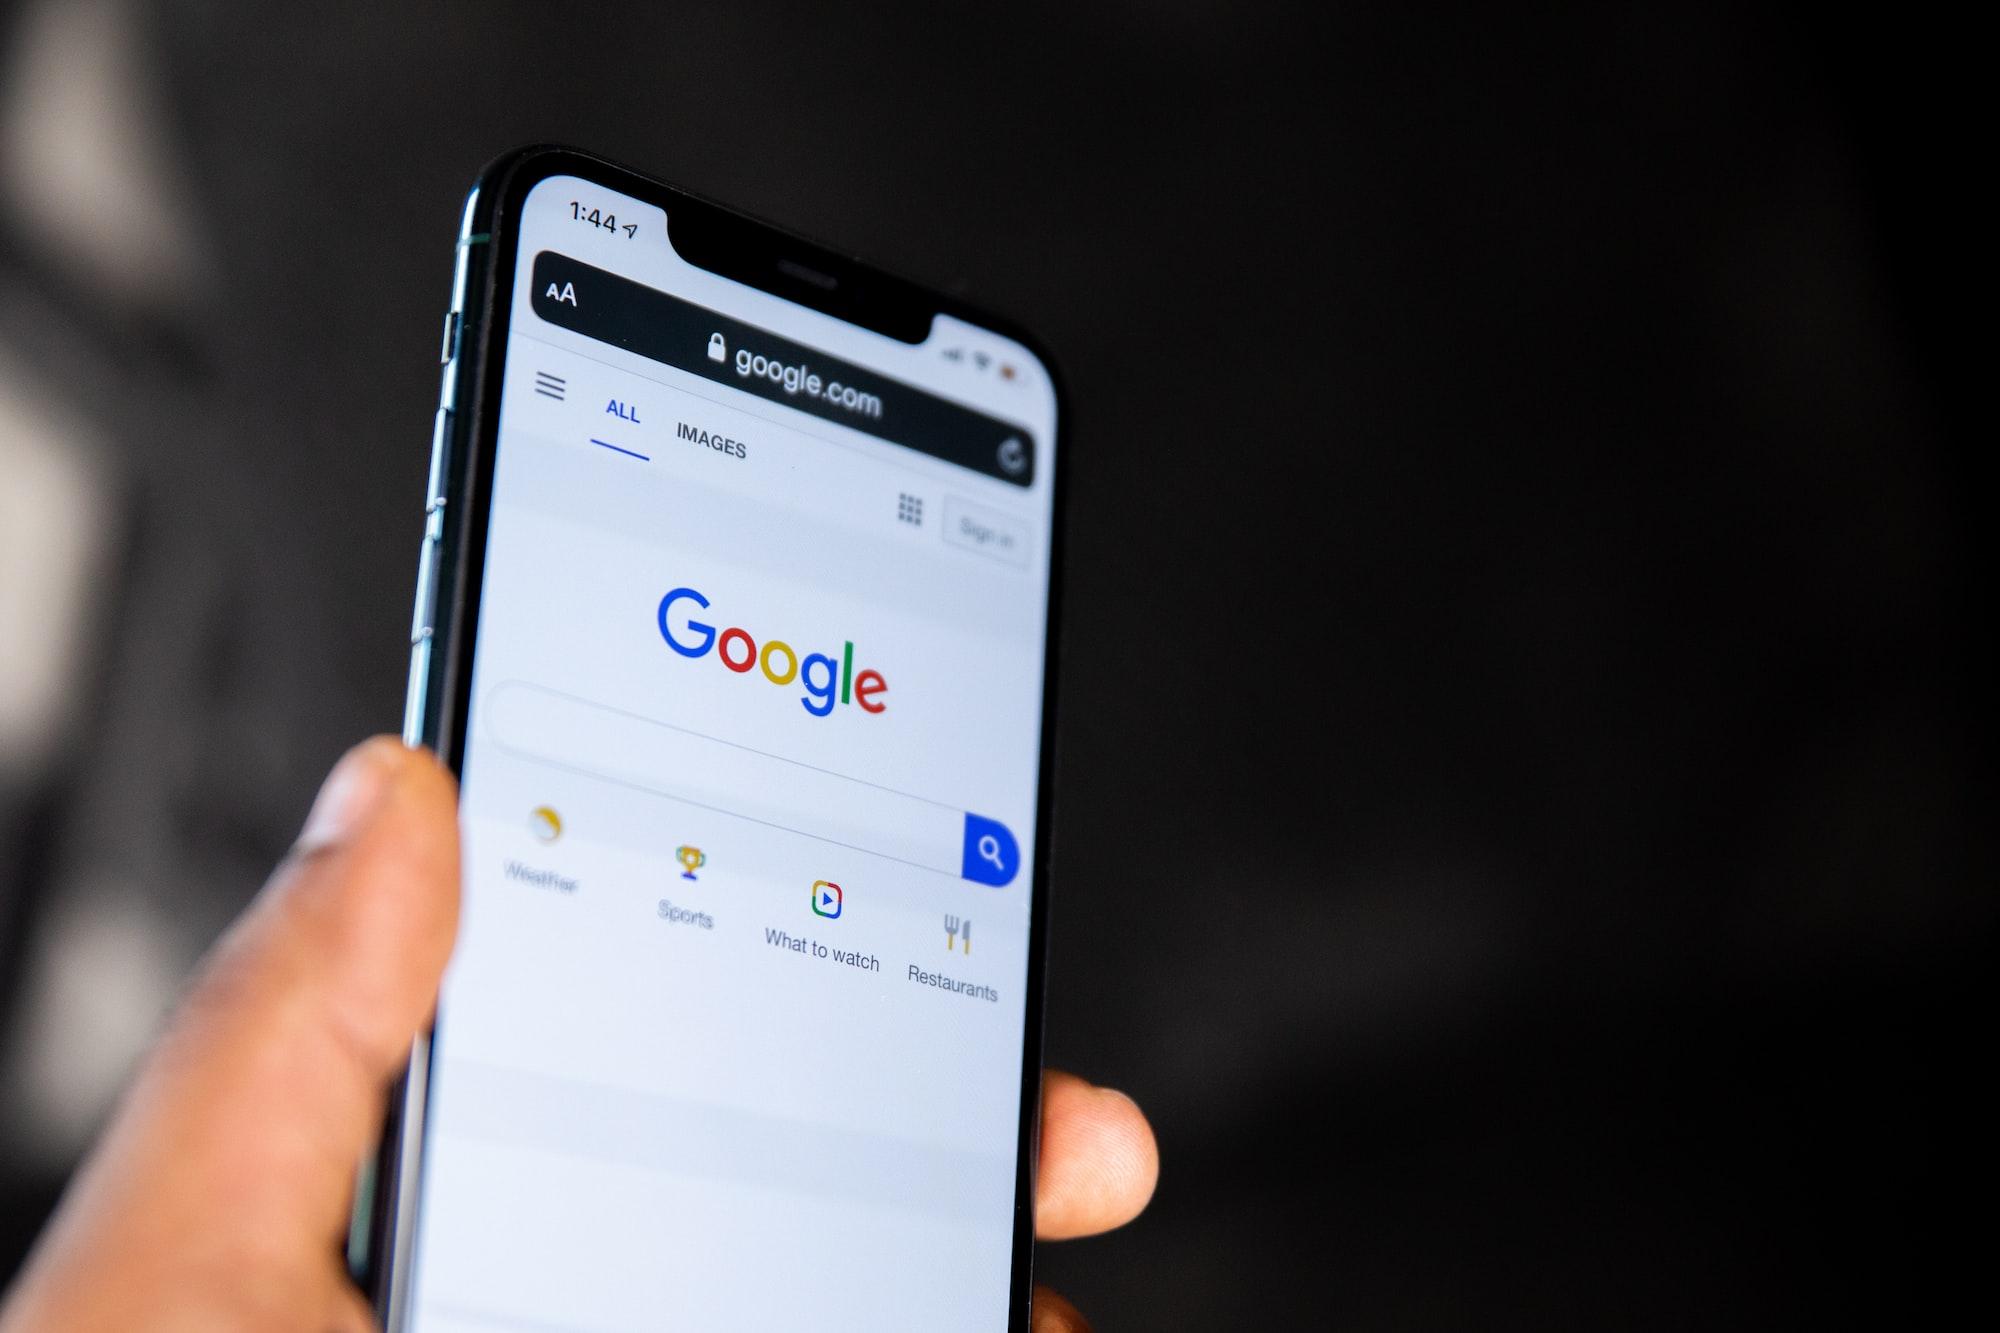 Google for Entrepreneur Returnees—Update #2—The UN and MIT's Solve